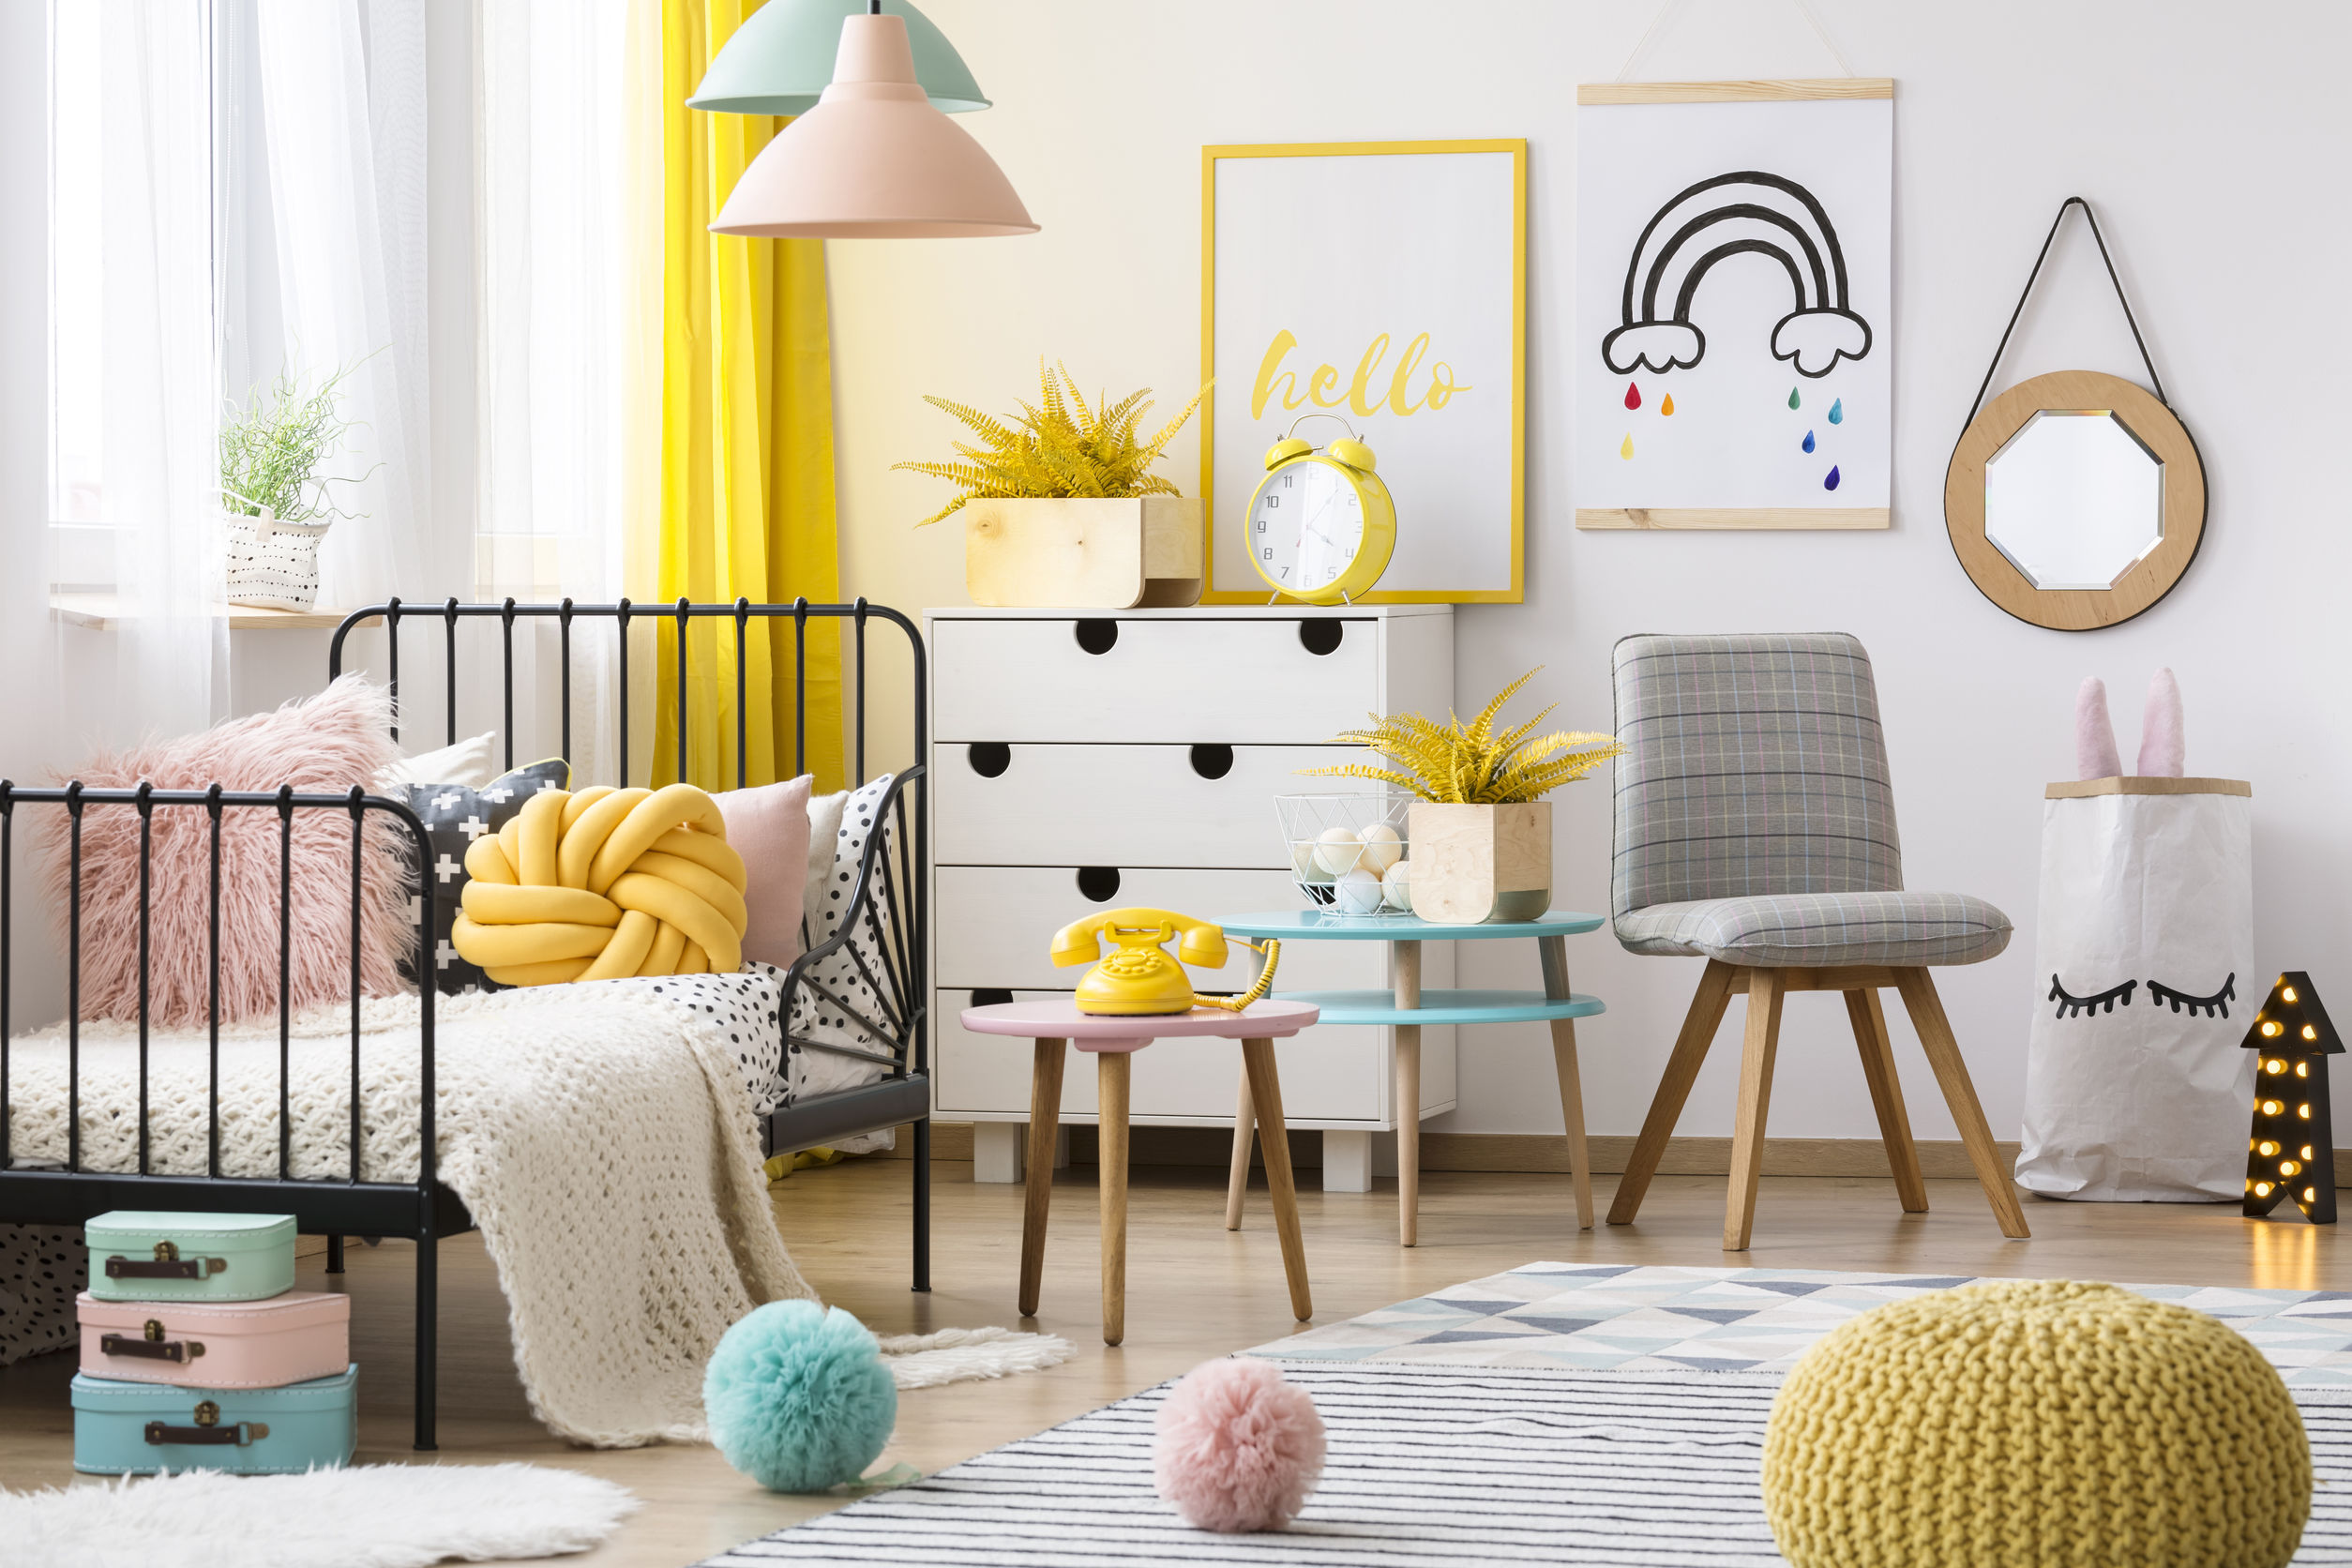 Colorful kid's bedroom interior